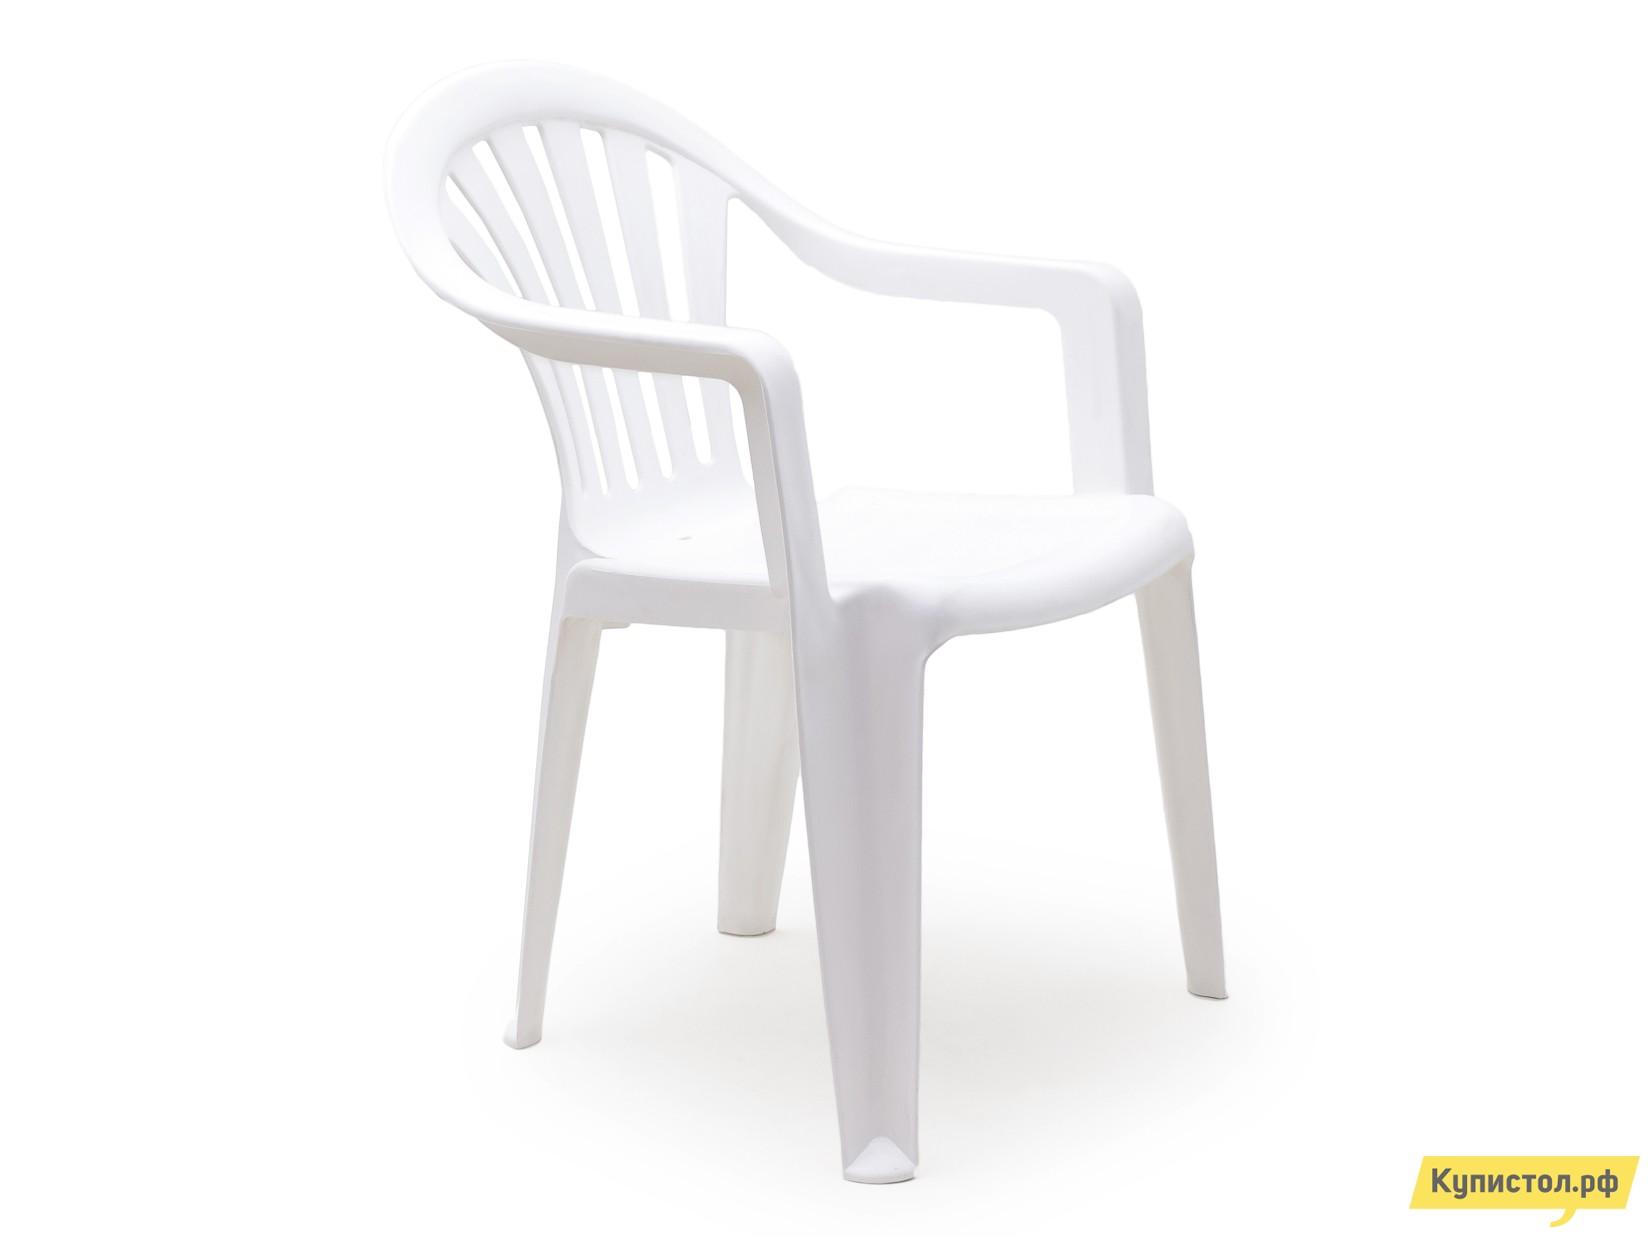 "Пластиковый стул Стандарт Пластик Кресло №1 ""Пальма-1"" (560х550х770мм) Белый"